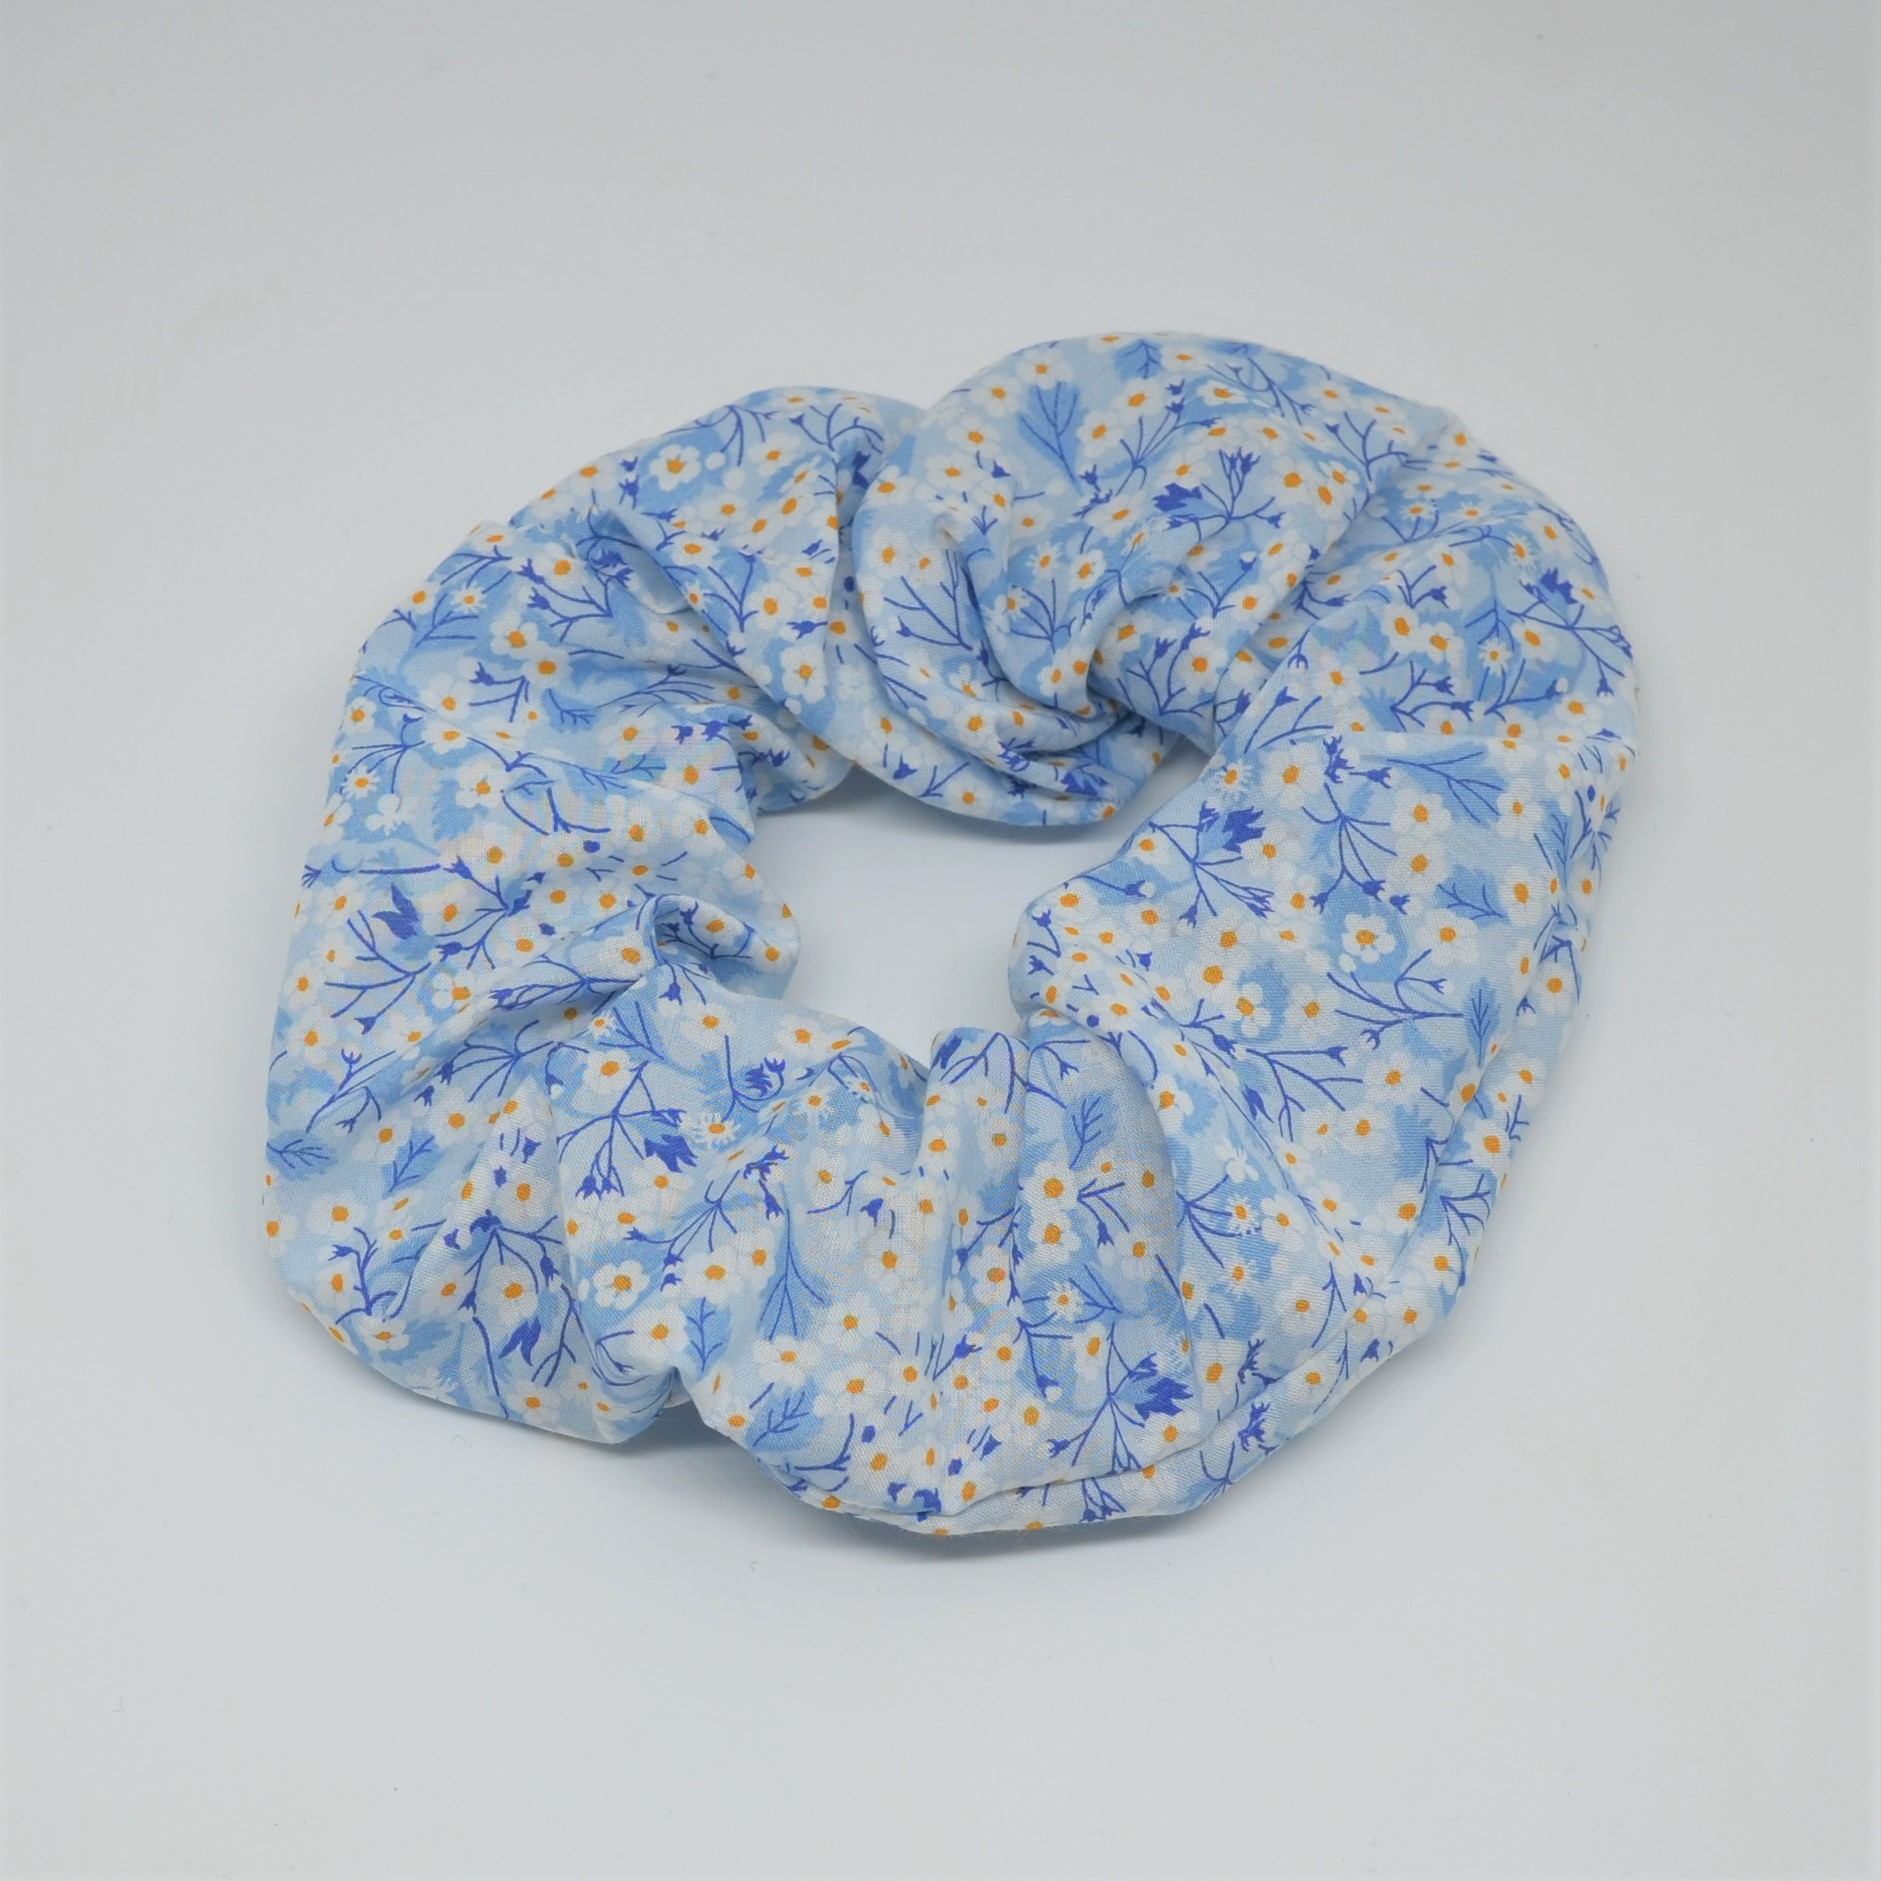 Chouchou cheveux scrunchie liberty Mitsi valeria bleu--9996055198575